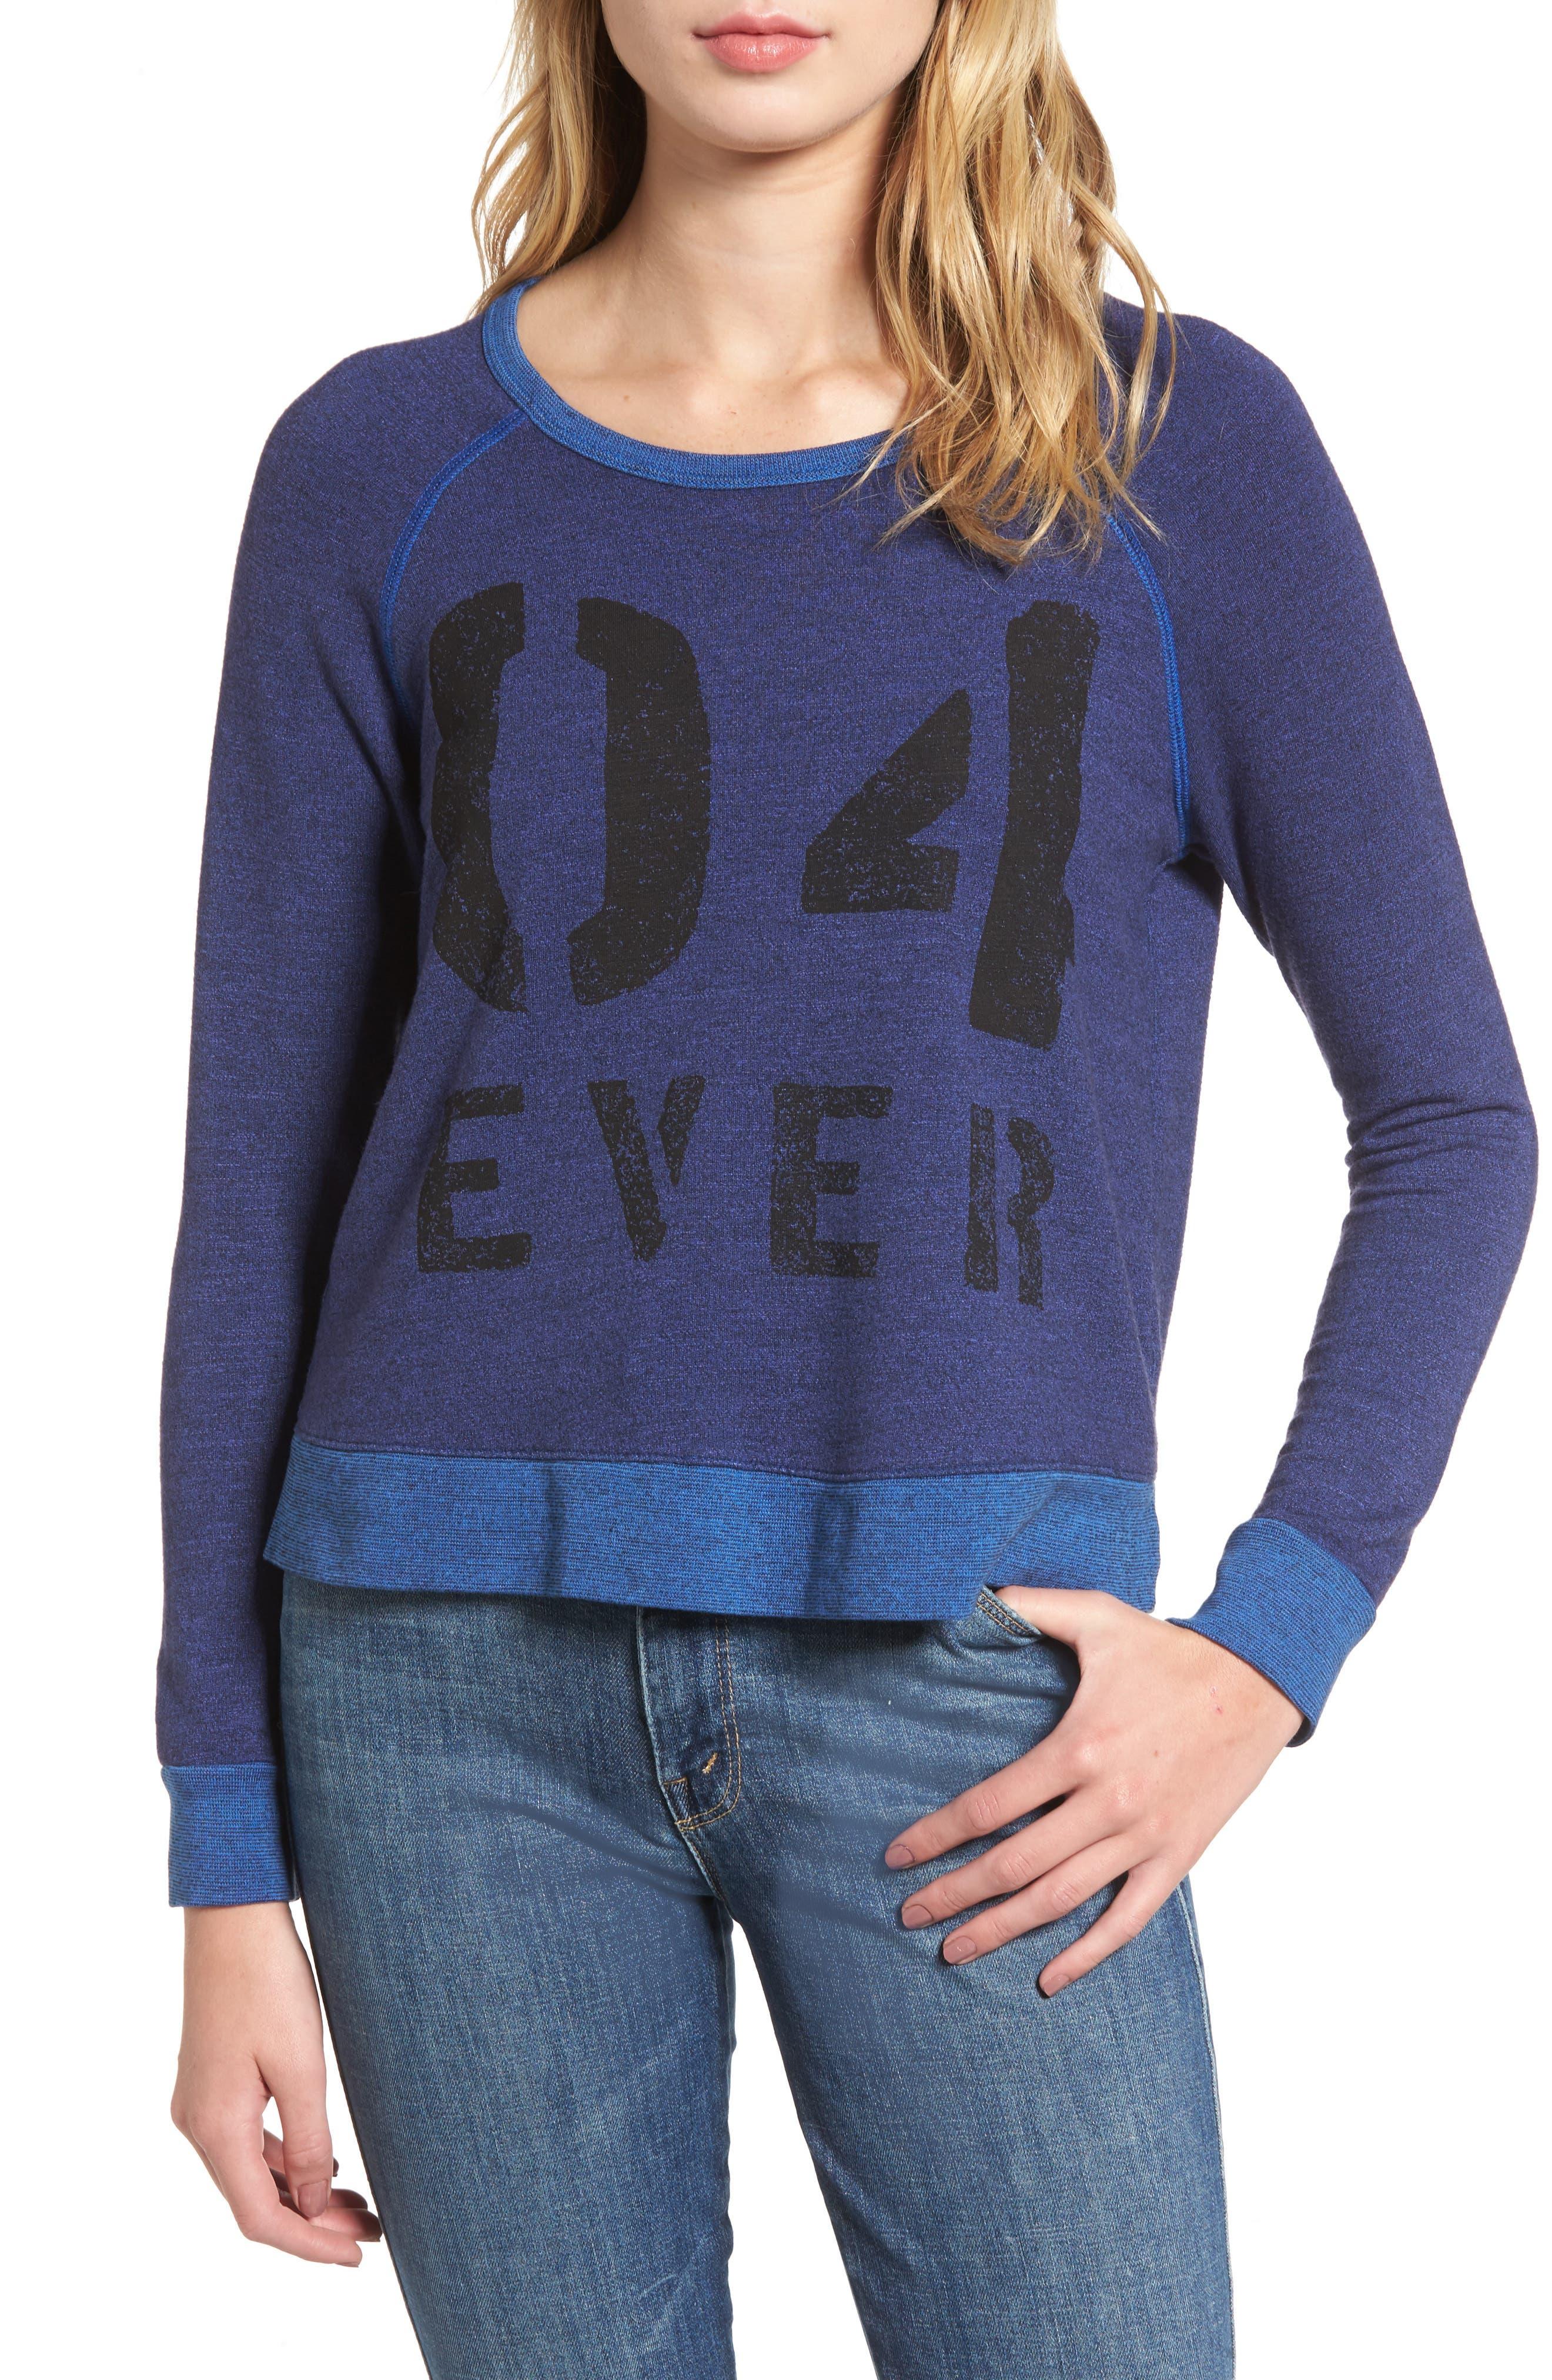 Alternate Image 1 Selected - Sundry Love Forever Sweatshirt